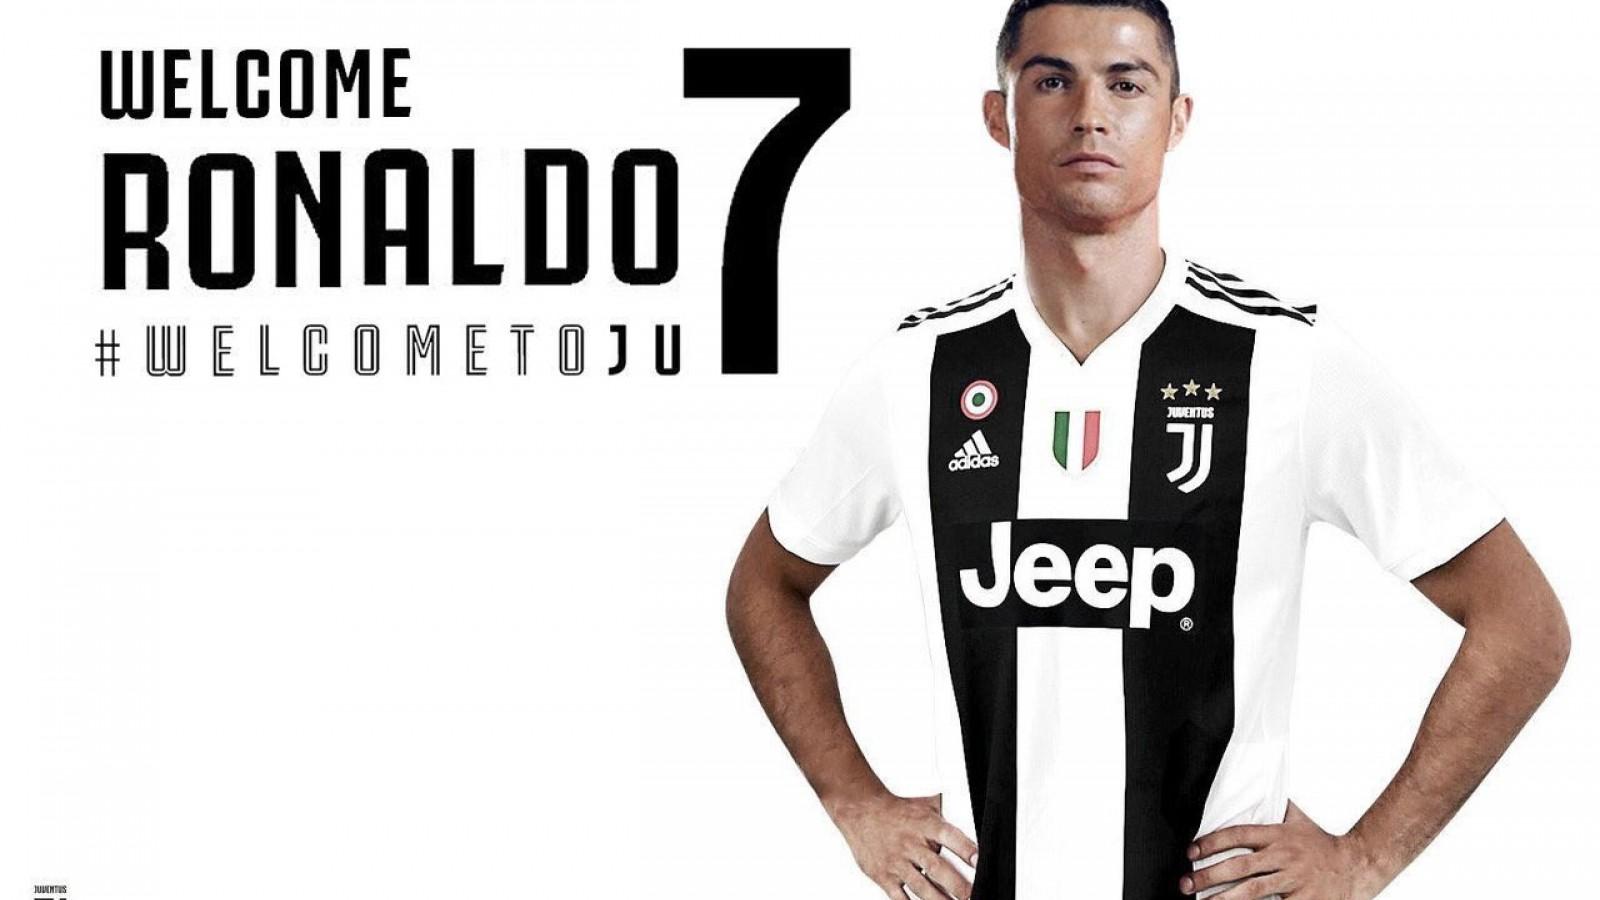 Cristiano Ronaldo Juventus 1600x900 Hd Wallpaper Wallpapers Net